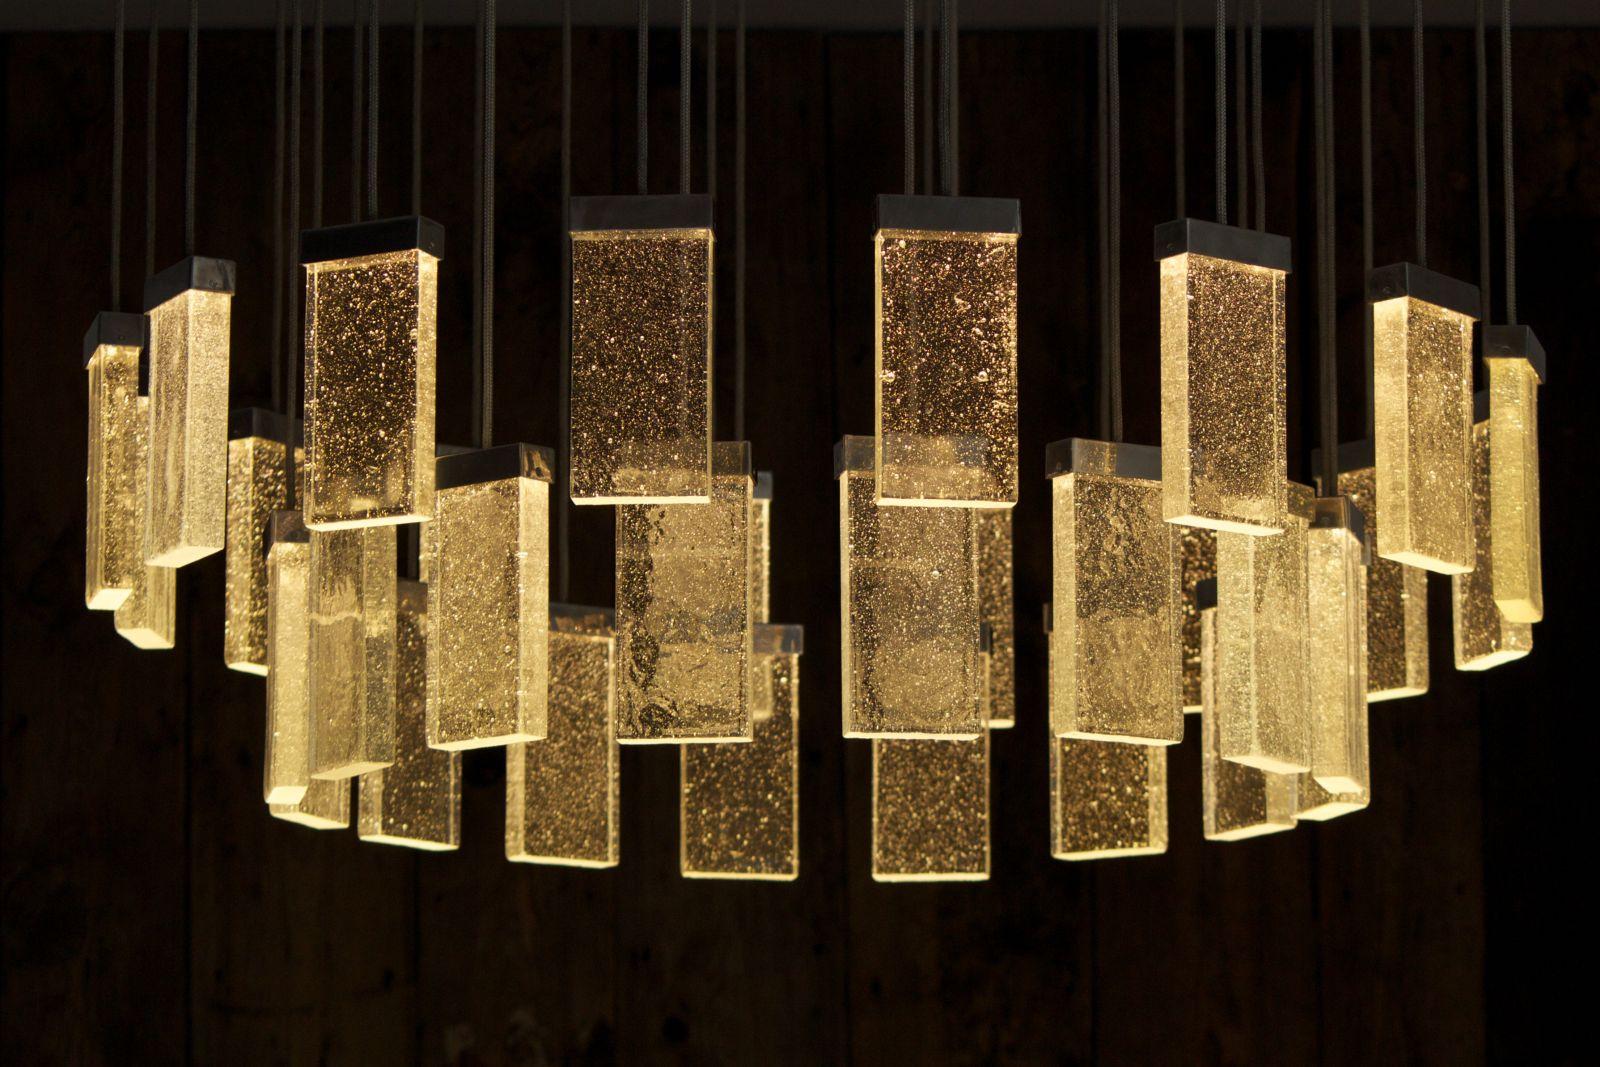 Lmpara araa moderna de vidrio de aluminio led 32 grand cru lmpara araa moderna de vidrio de aluminio led aloadofball Gallery